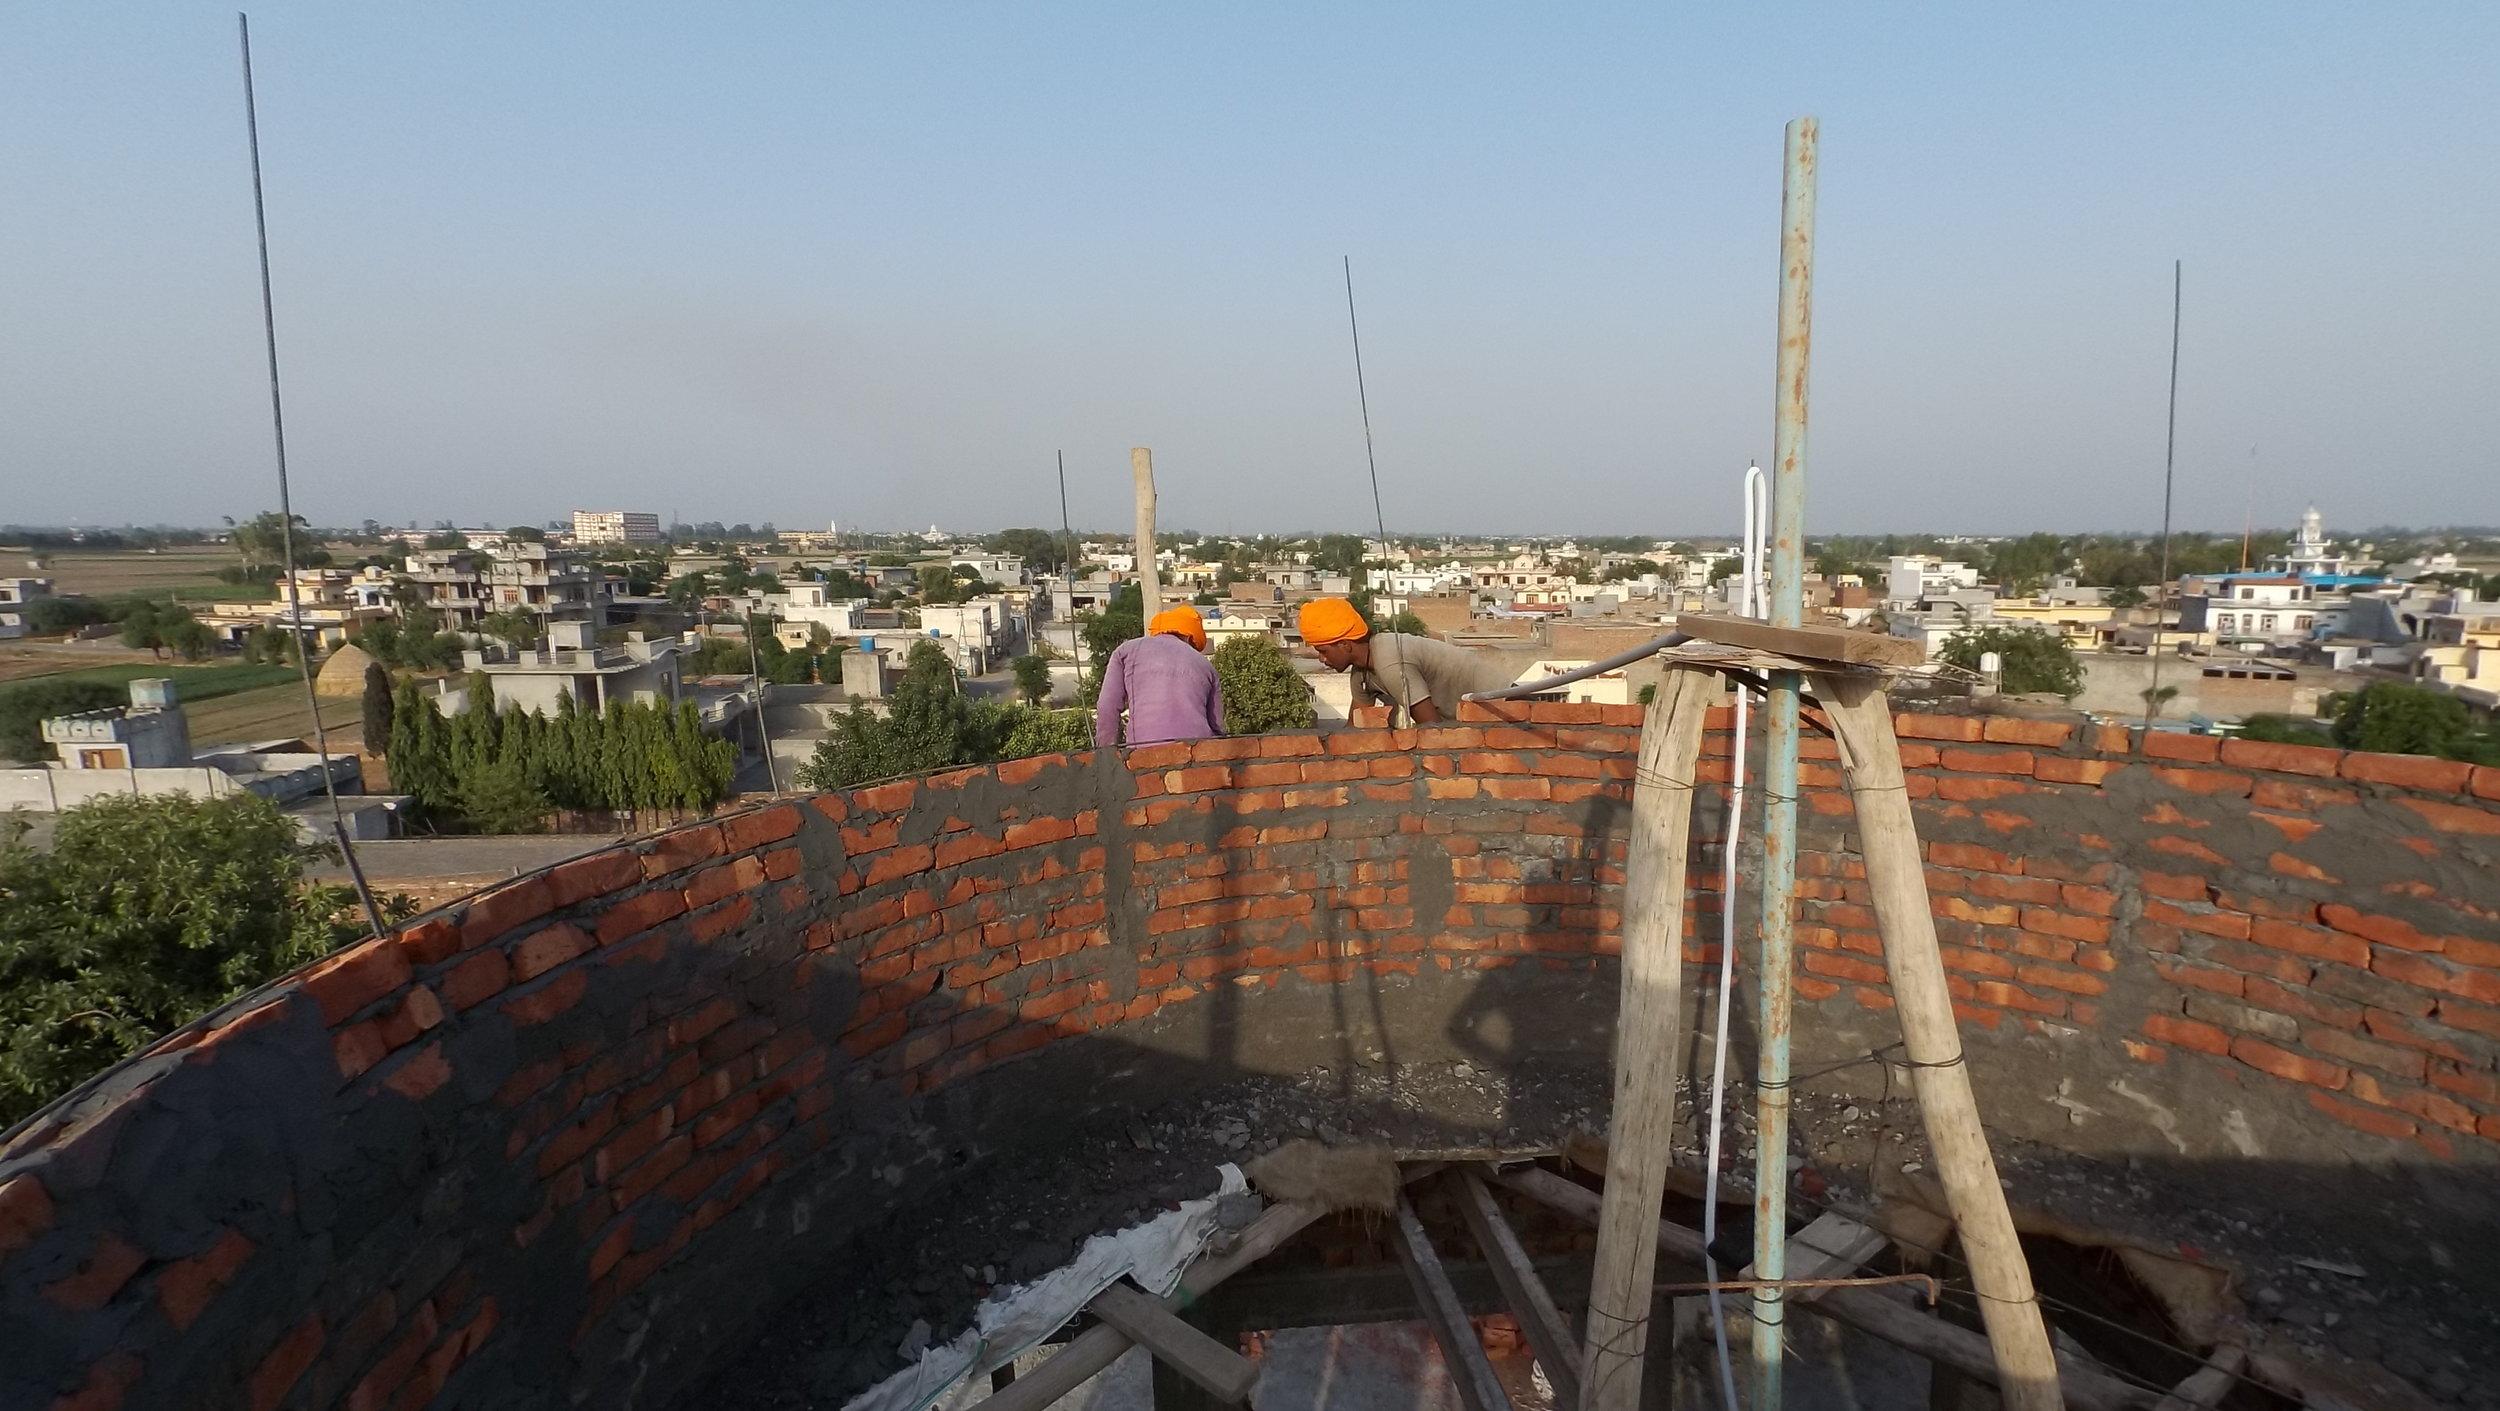 Brick-laying of a building in progress, Ludhiana, 9 June 2016